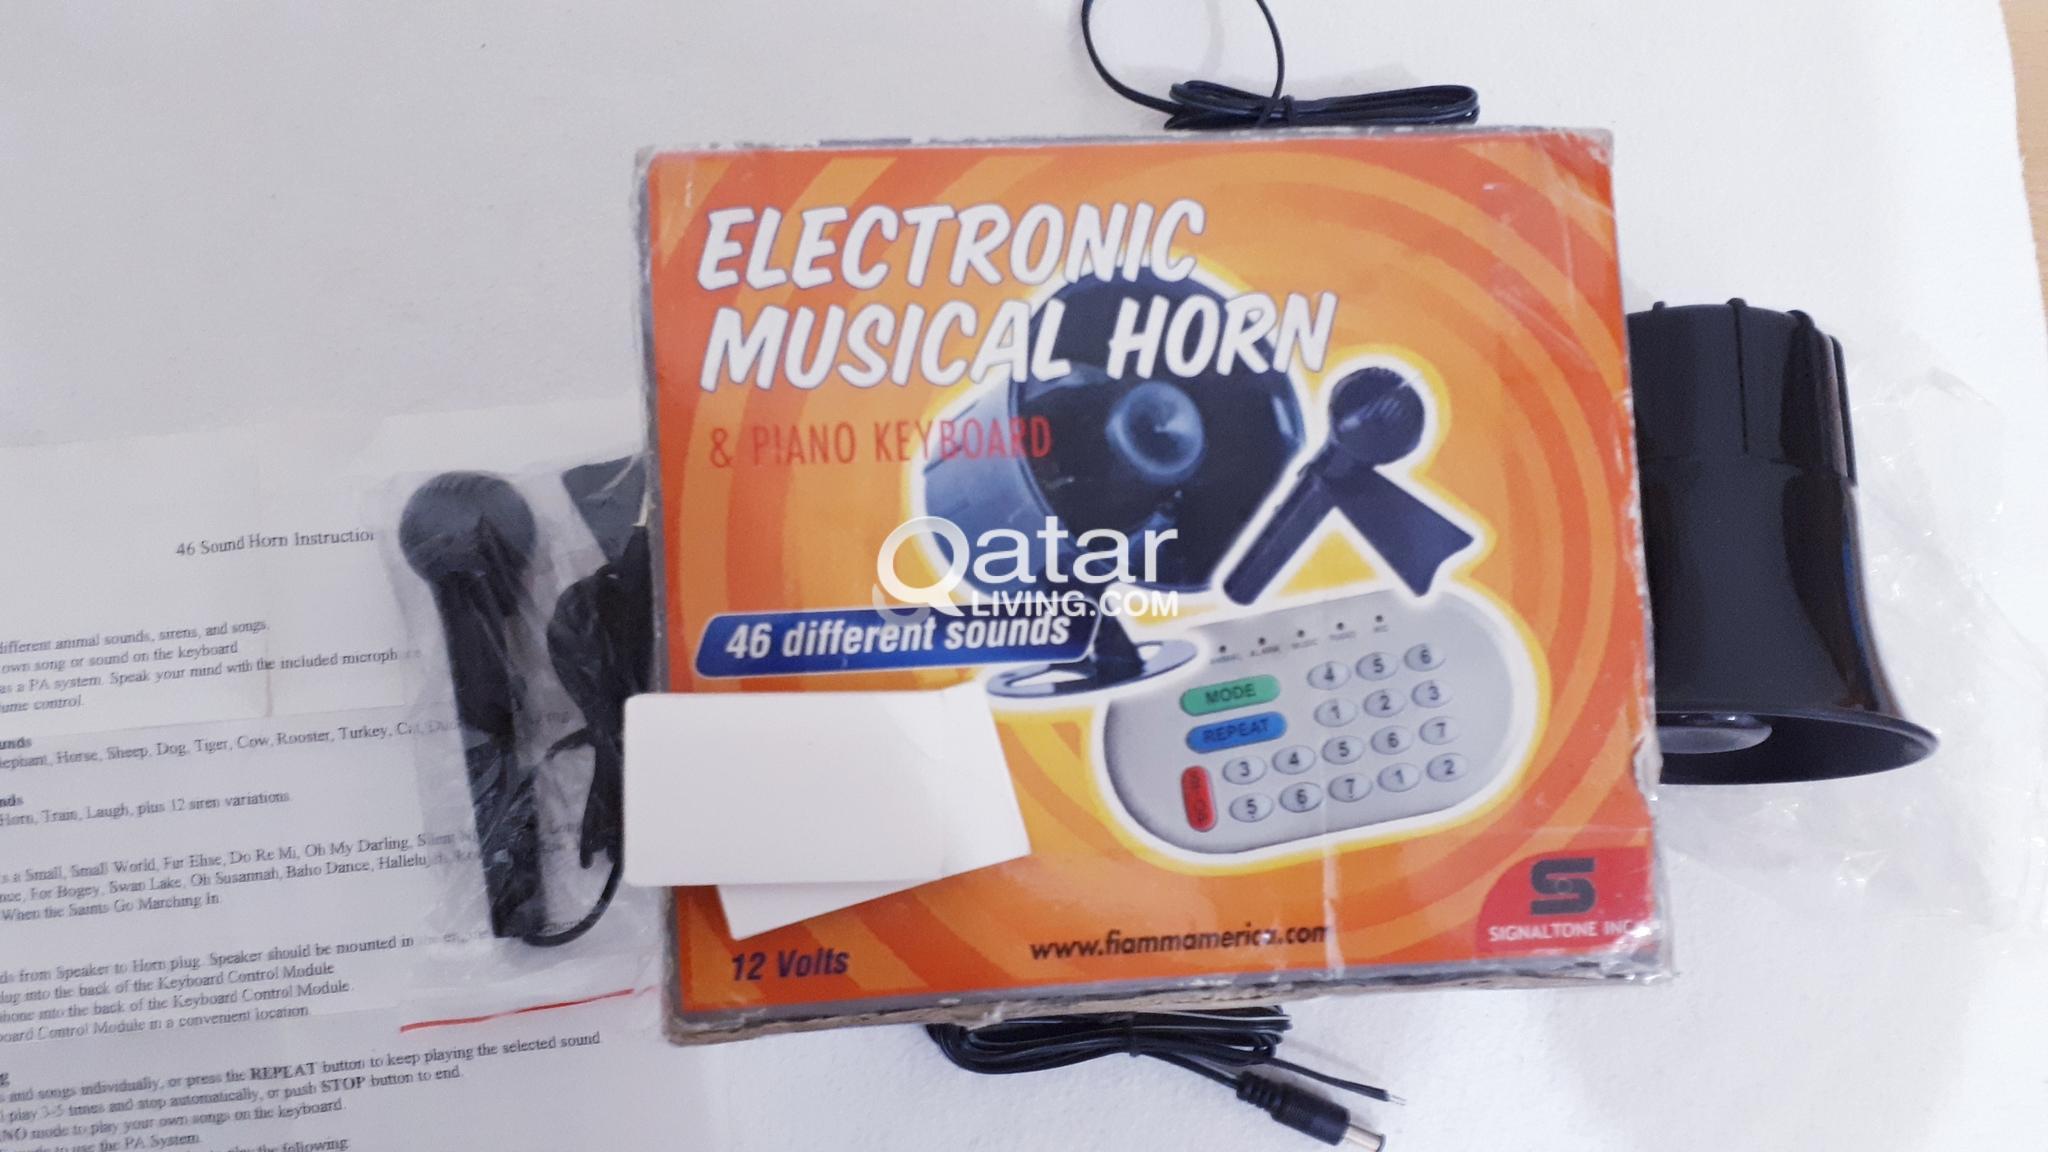 SALE!! NEW Music Car Horn w/mic + Piano | Qatar Living